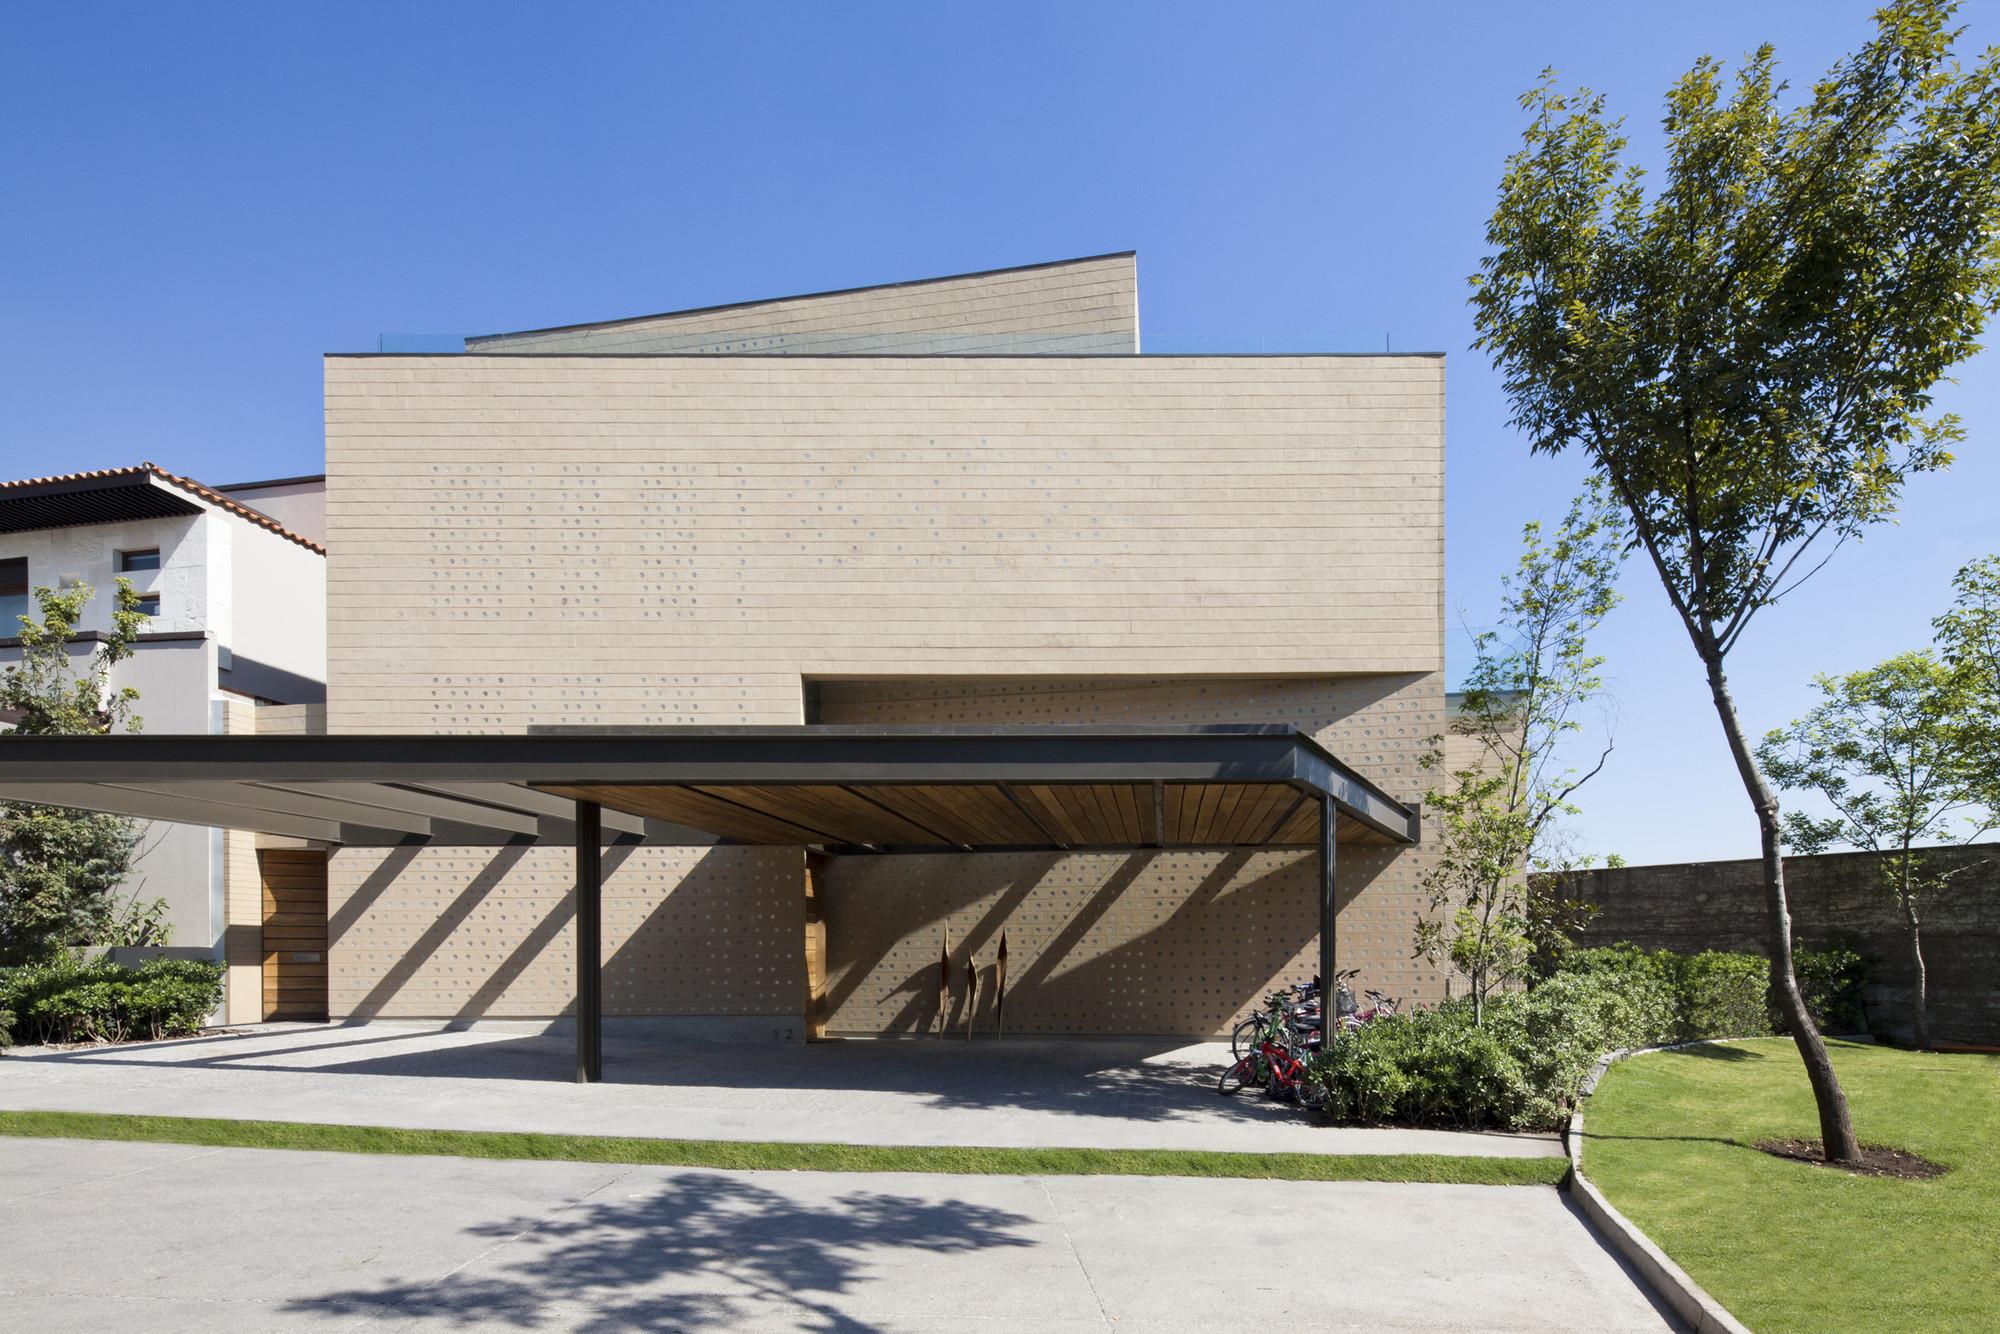 Casa Tierra / Serrano Monjaraz Arquitectos, © Pedro Hiriart